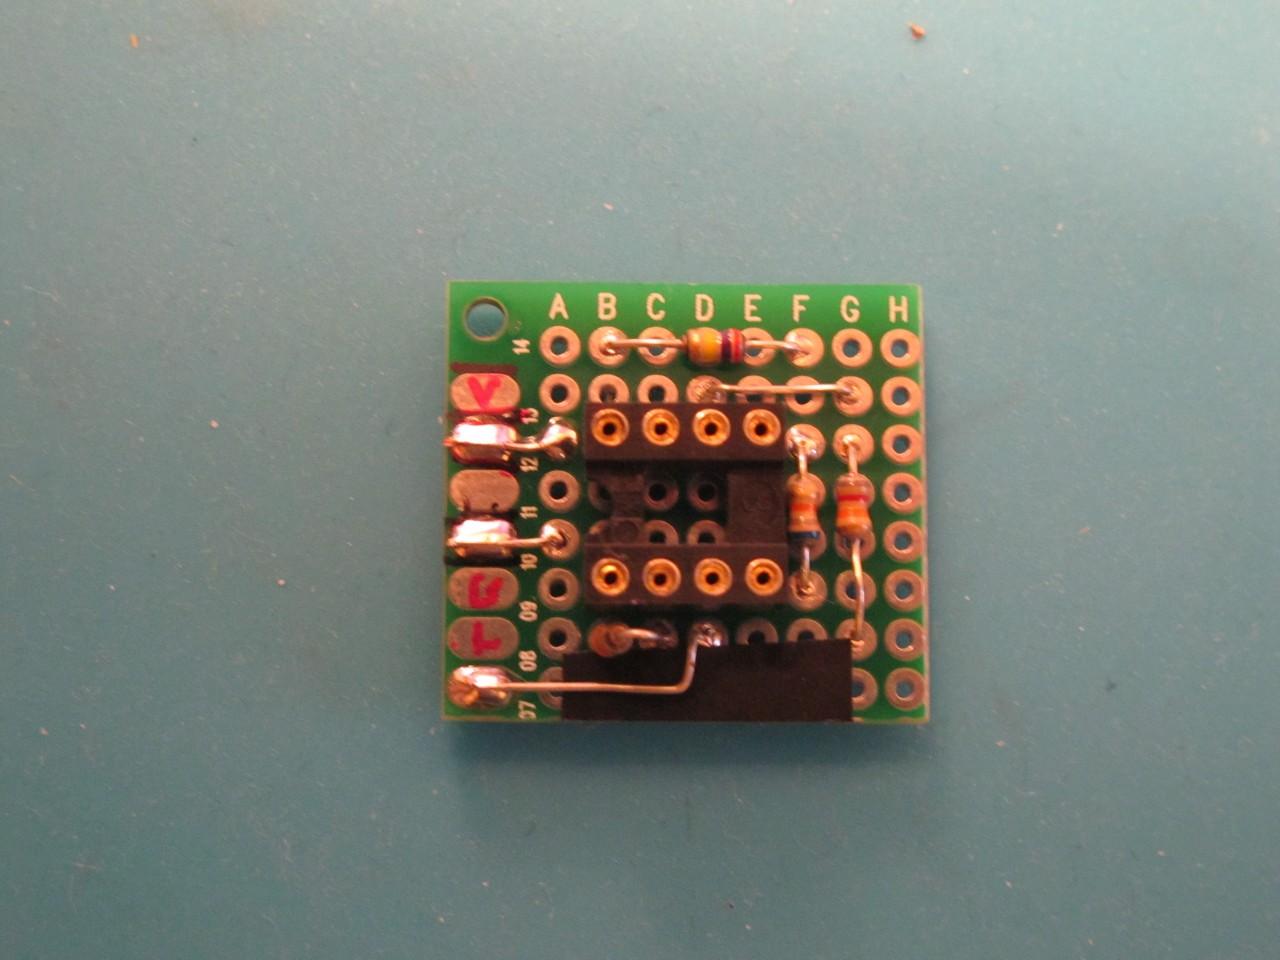 LFO scaling/biasing circuit made on protoboard